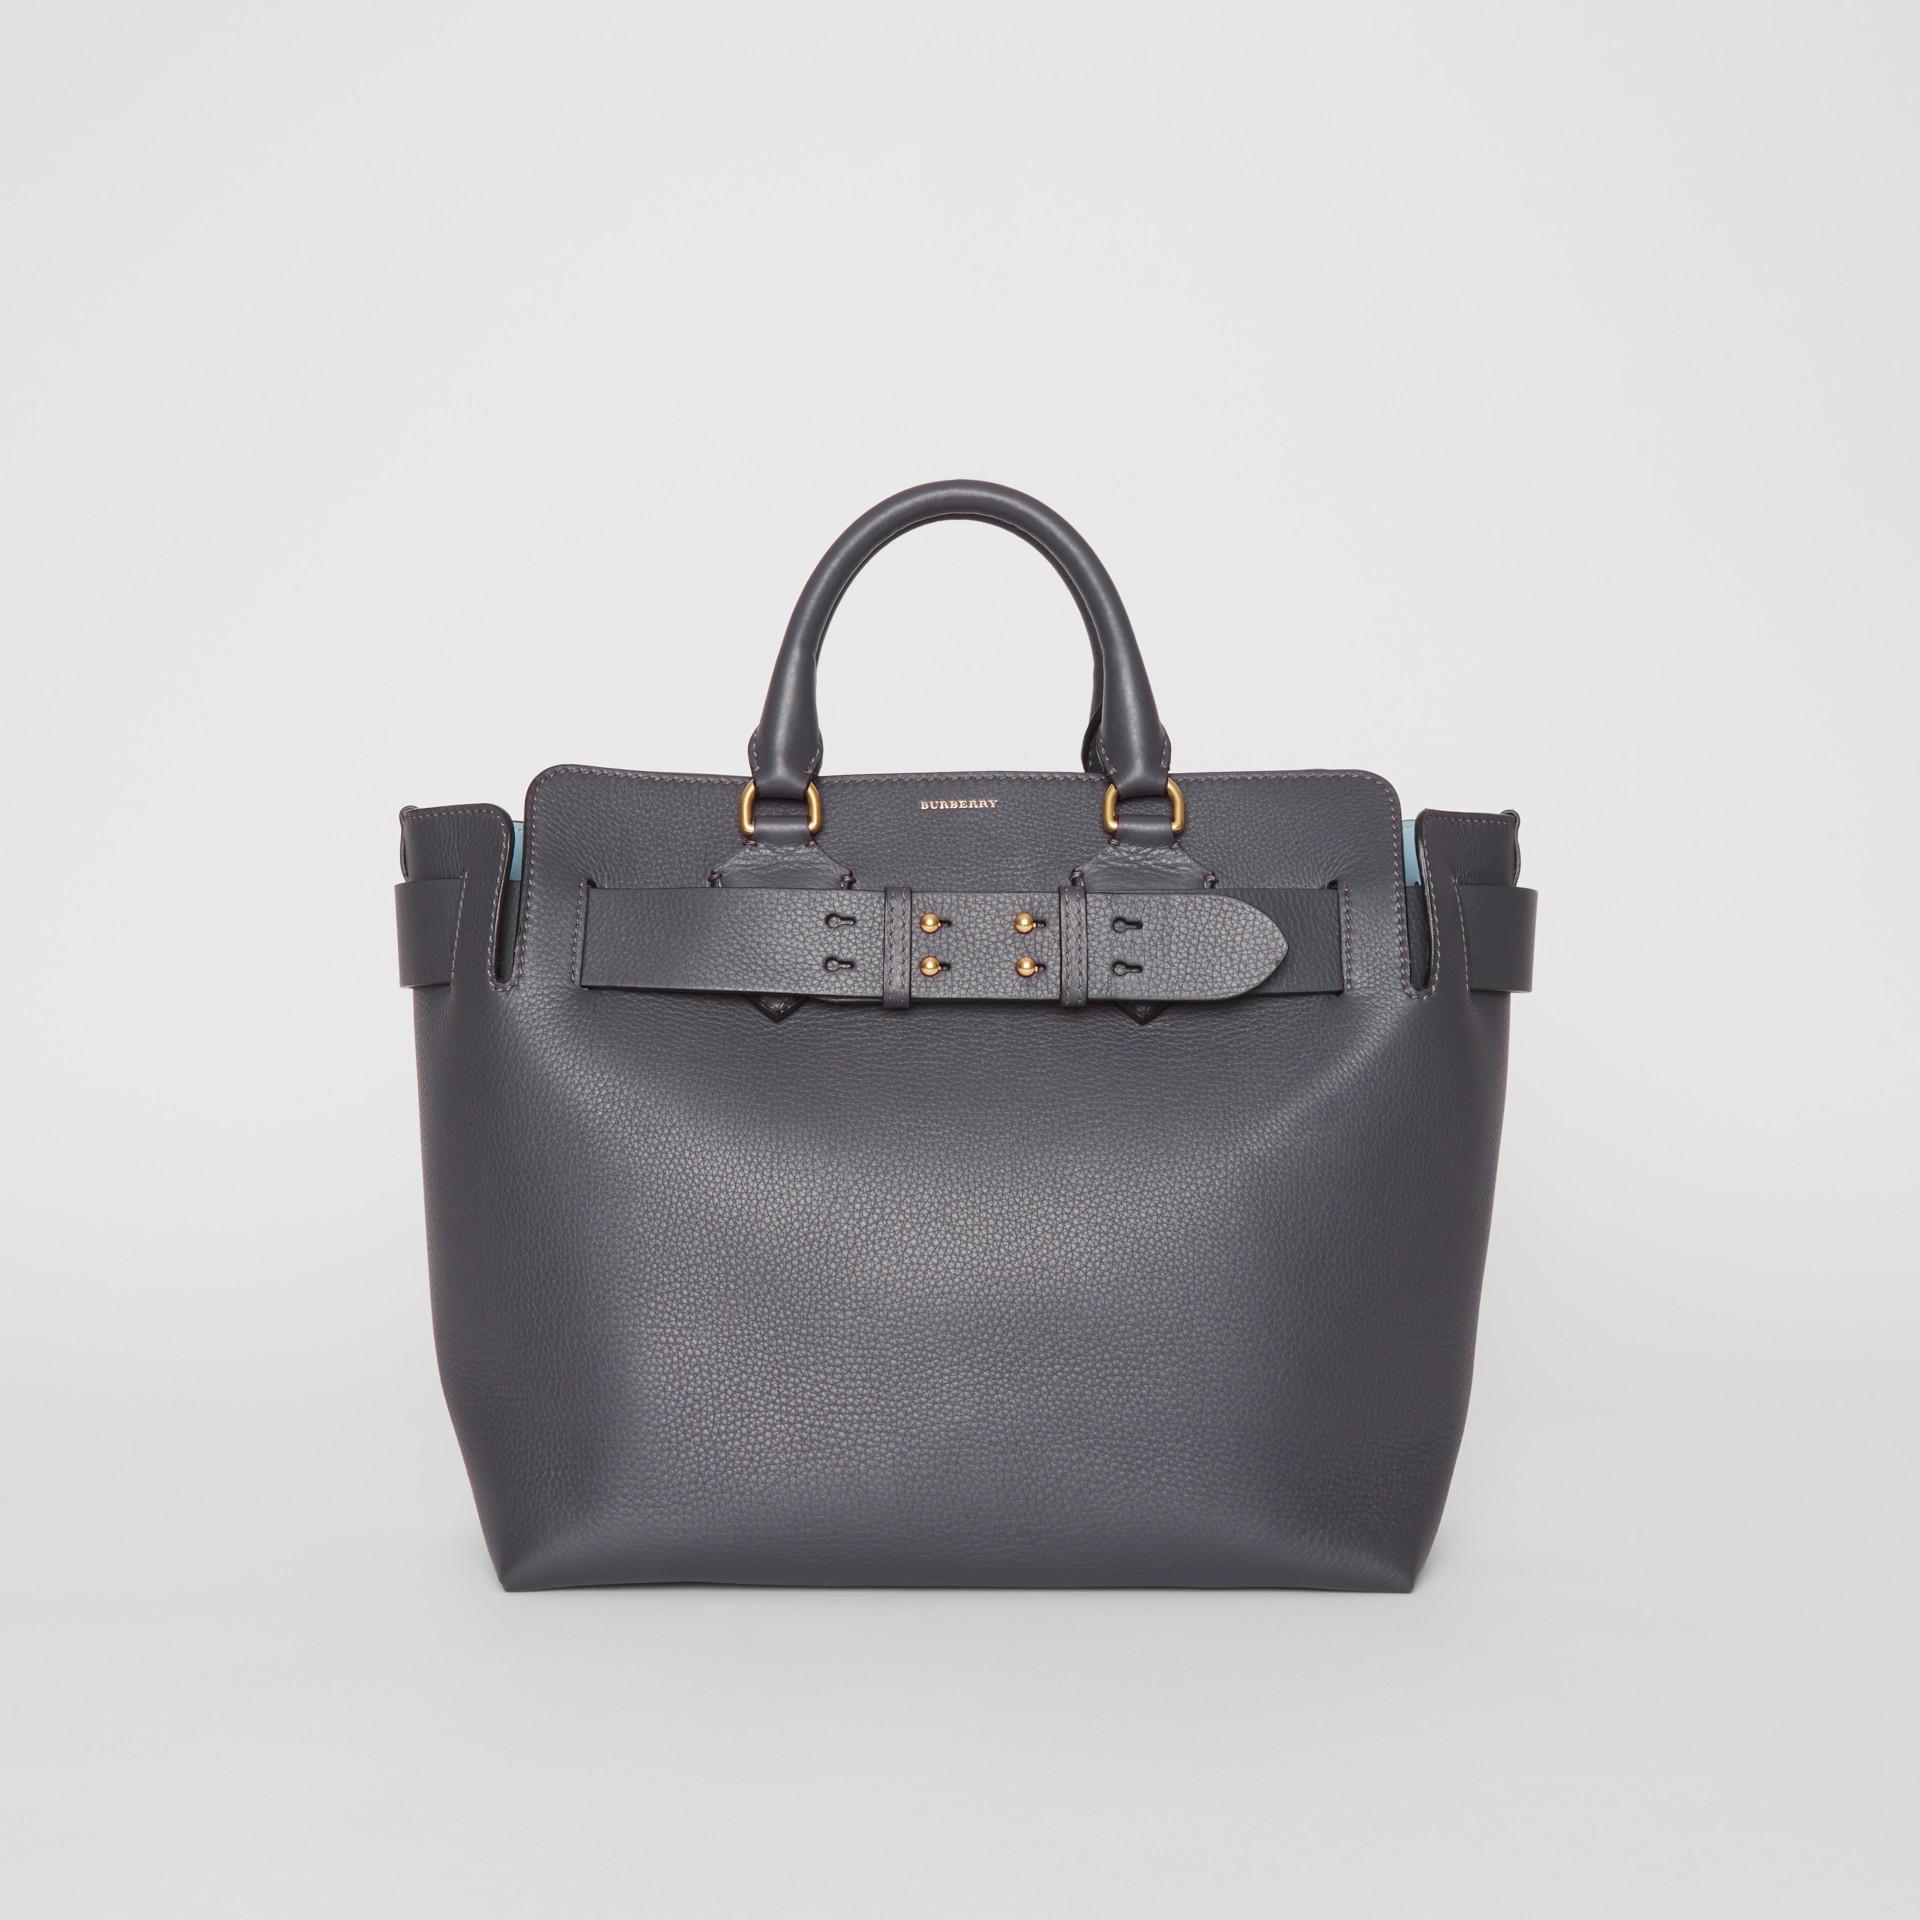 Burberry The Medium Belt Bag Aus Leder In Charcoal Grey   ModeSens 779b19ccf6